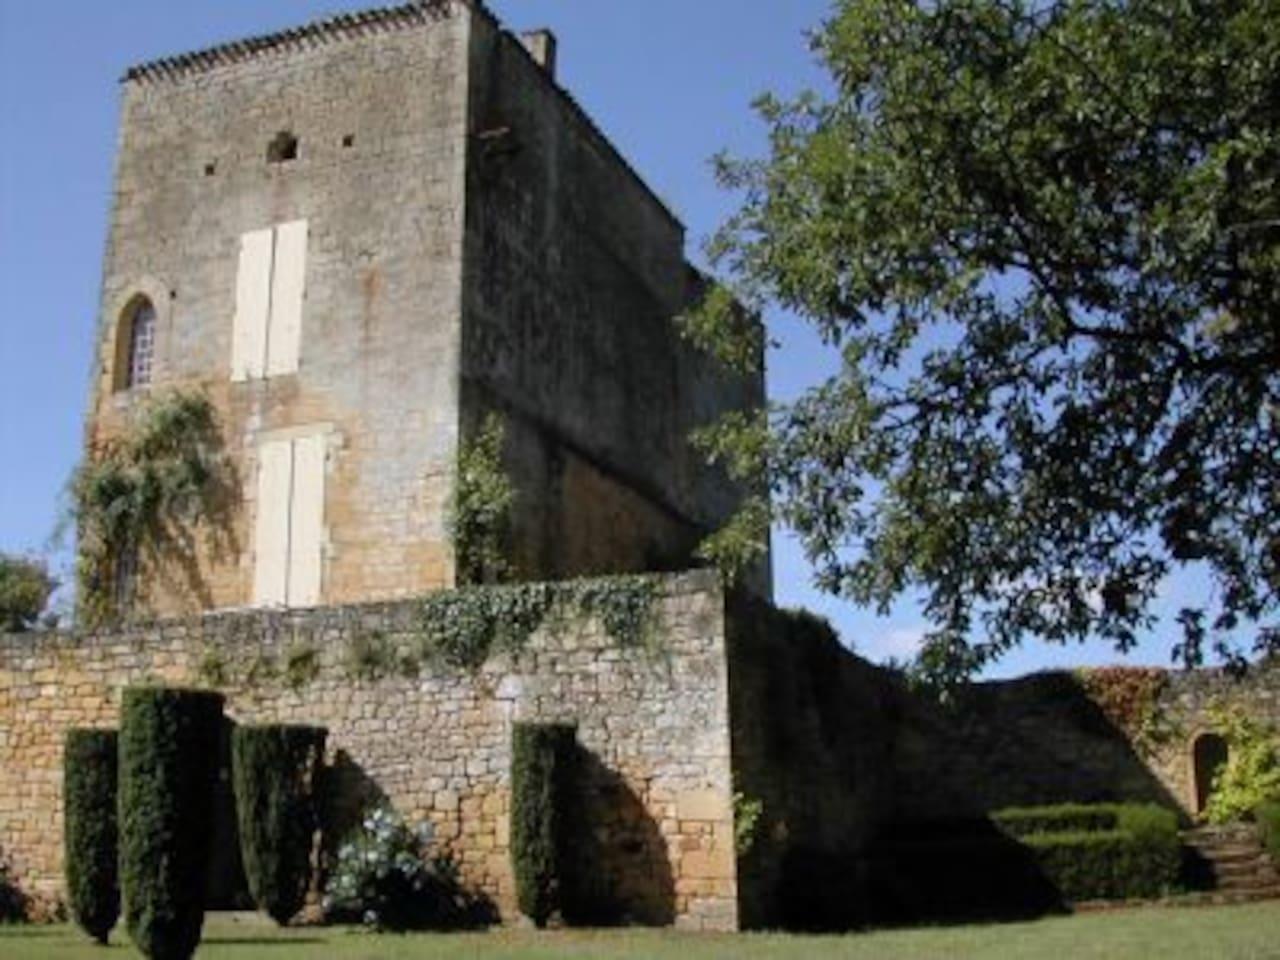 The tower of Le Donjon. La tour du Donjon.